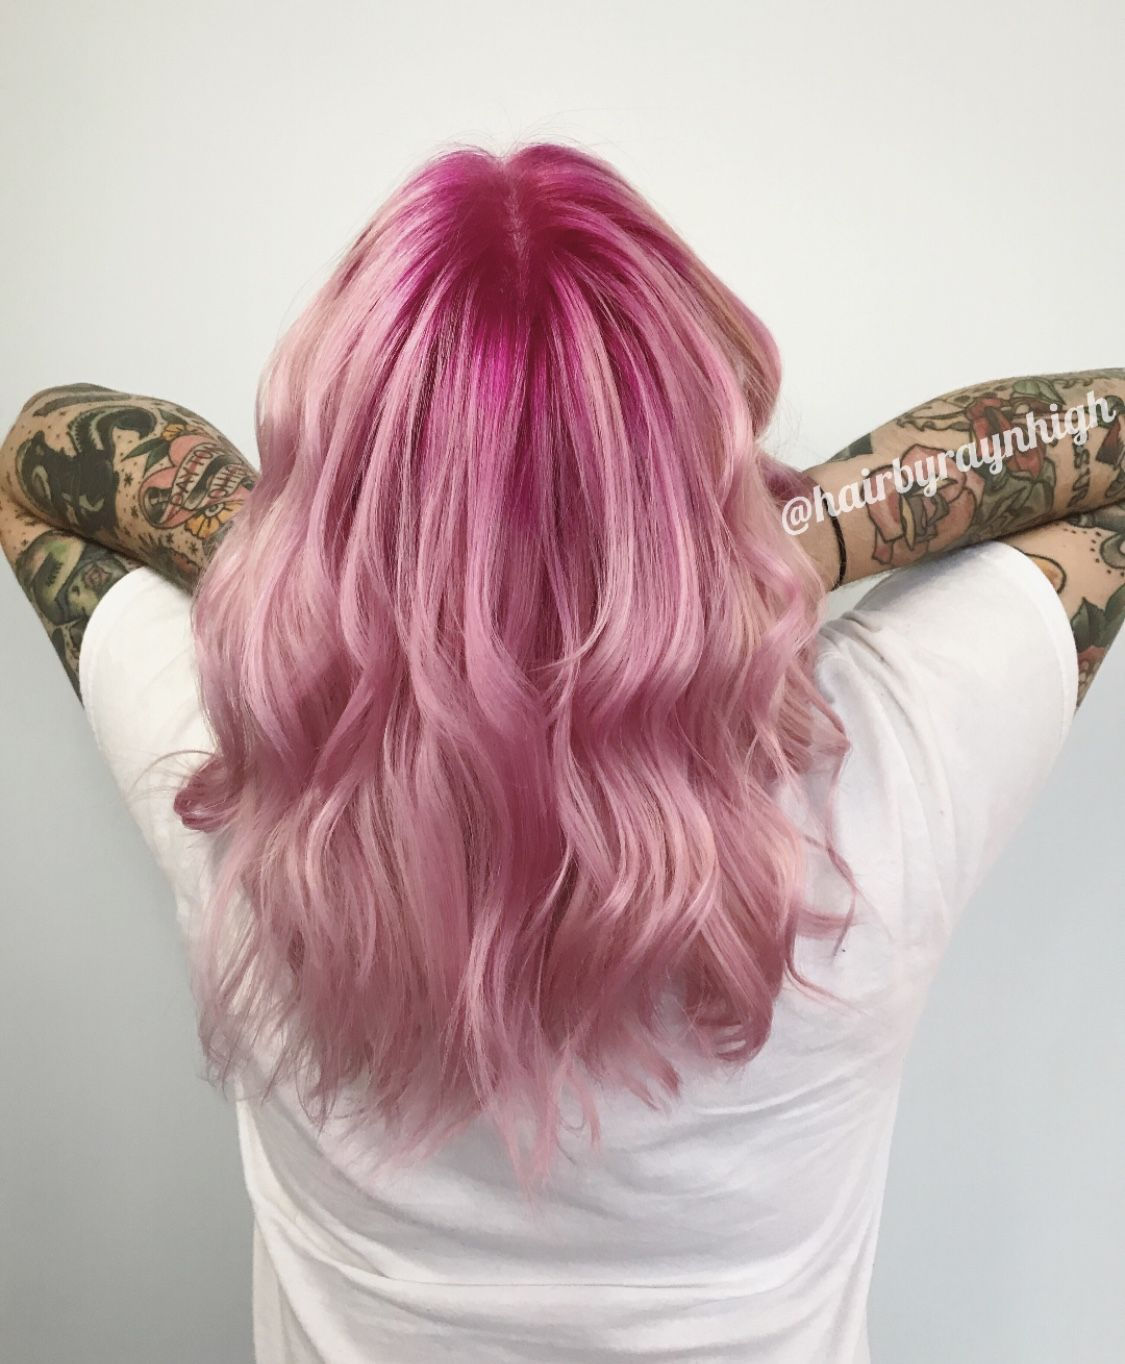 Hairbyraynhigh Pinkhair Pink Haircolor Hair Curls Vividhair